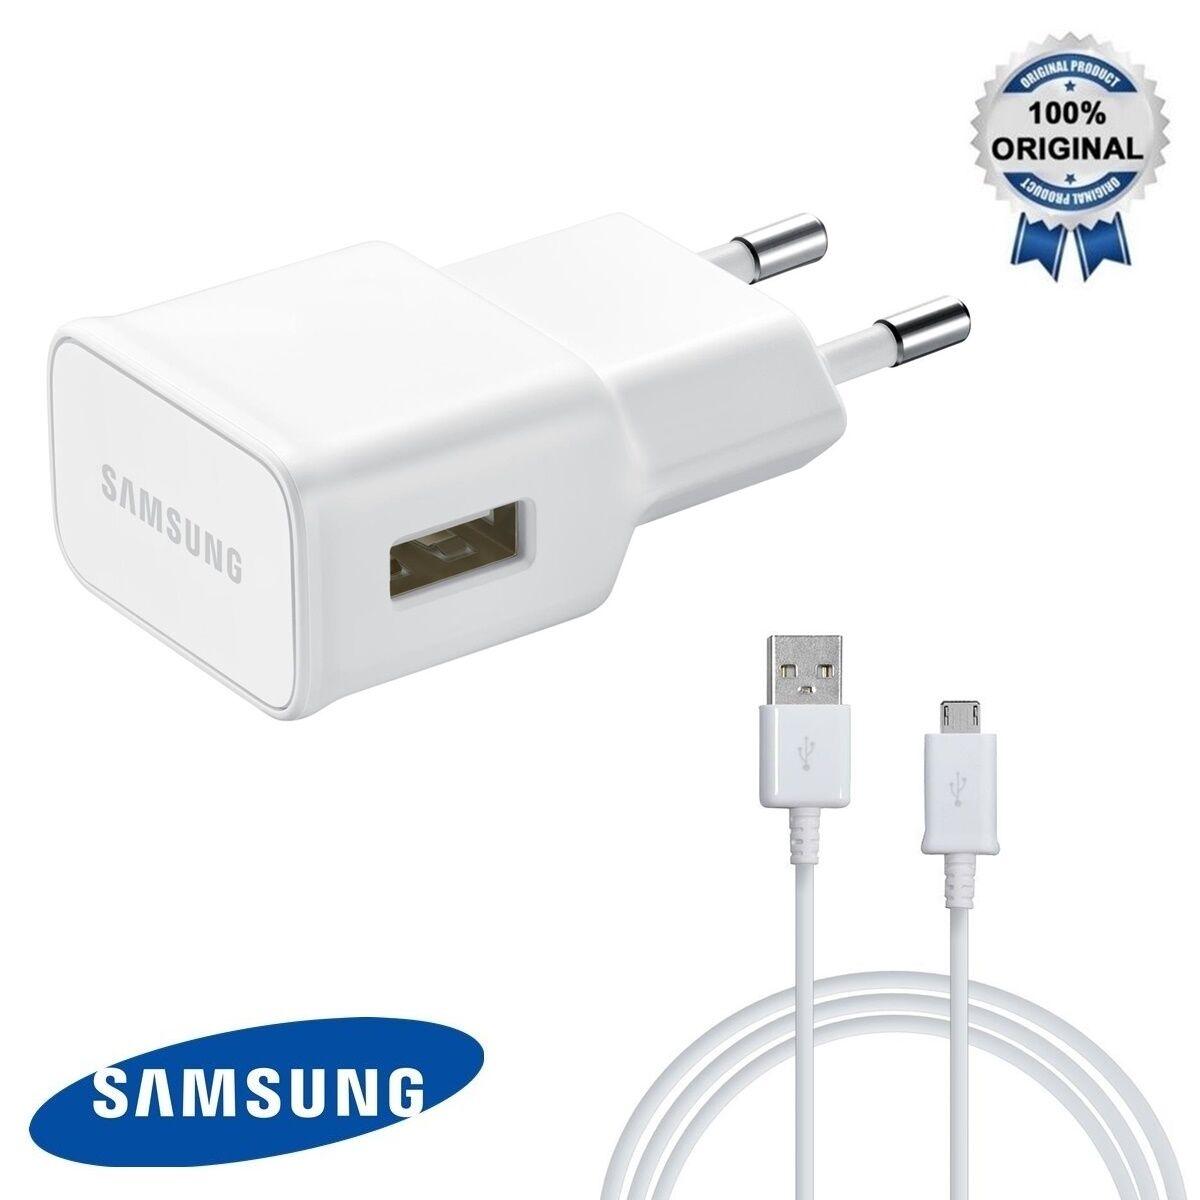 ALIMENTATORE RETE CARICABATTERIA SPINA+CAVO DATI RICARICA USB ORIGINALE SAMSUNG